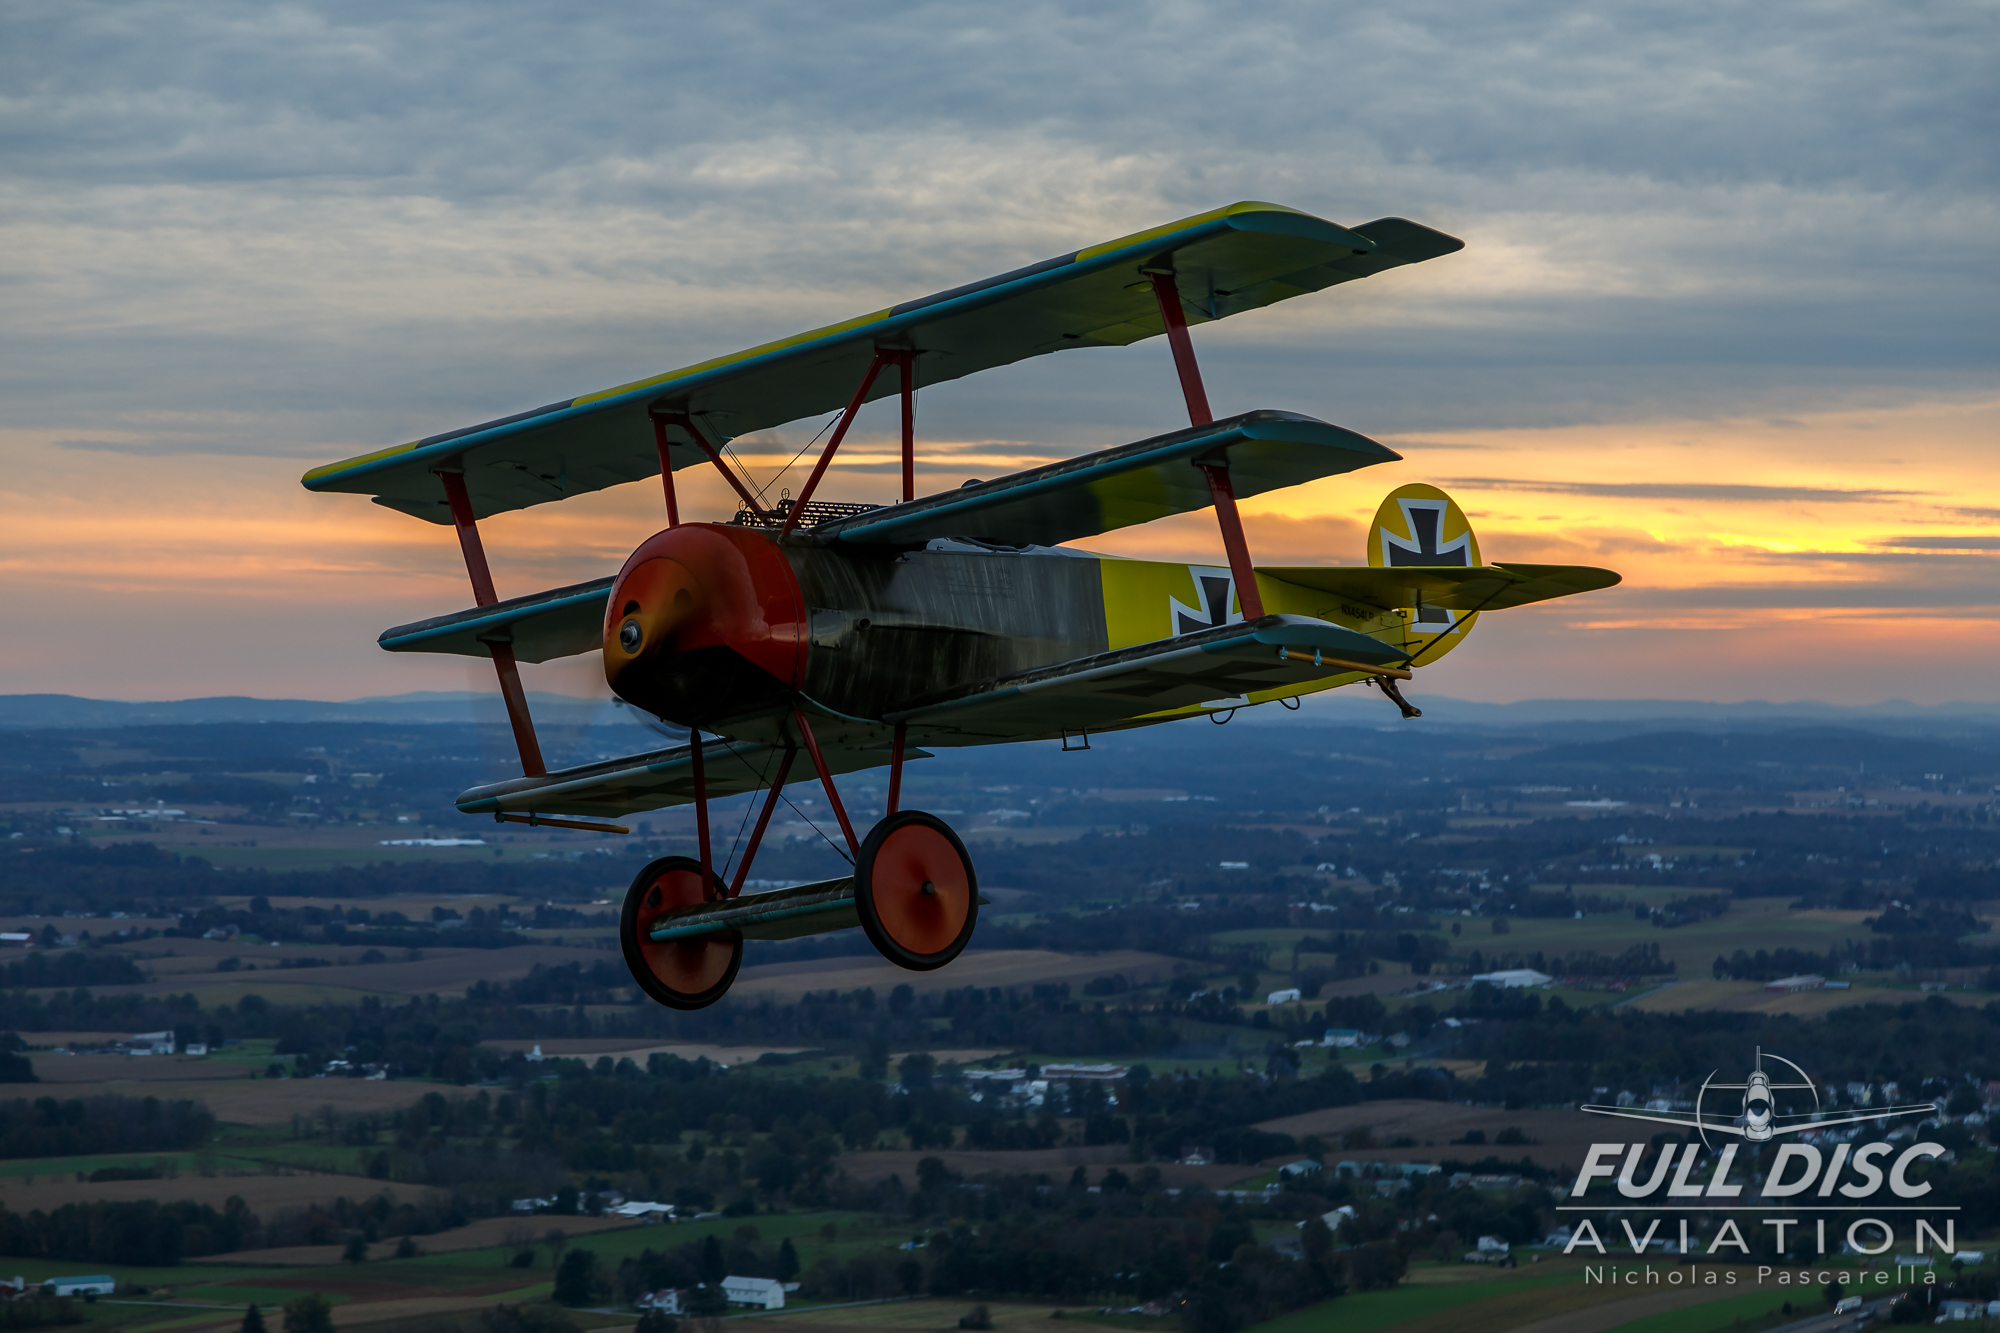 nickpascarella_nicholaspascarella_fulldiscaviation_aircraft_fokkerdr1_sunset.jpg